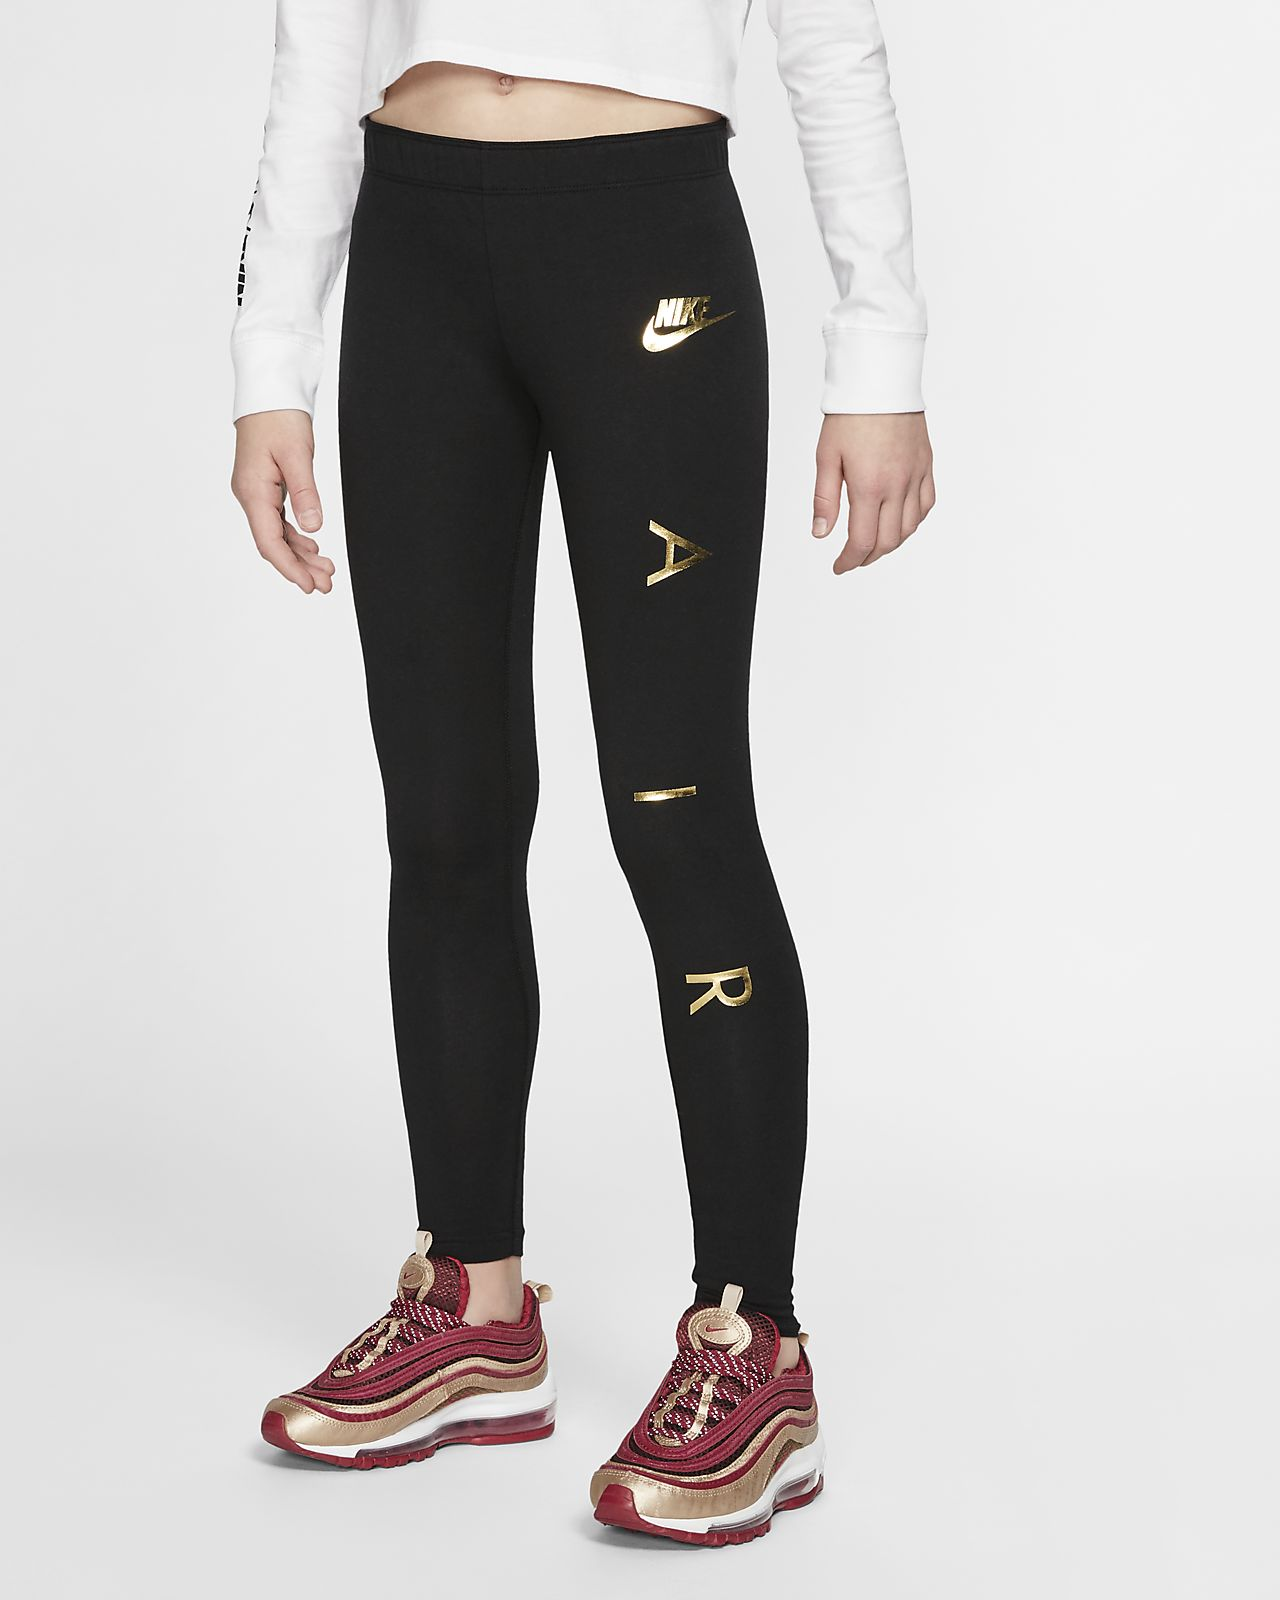 Nike Air大童(女孩)紧身裤